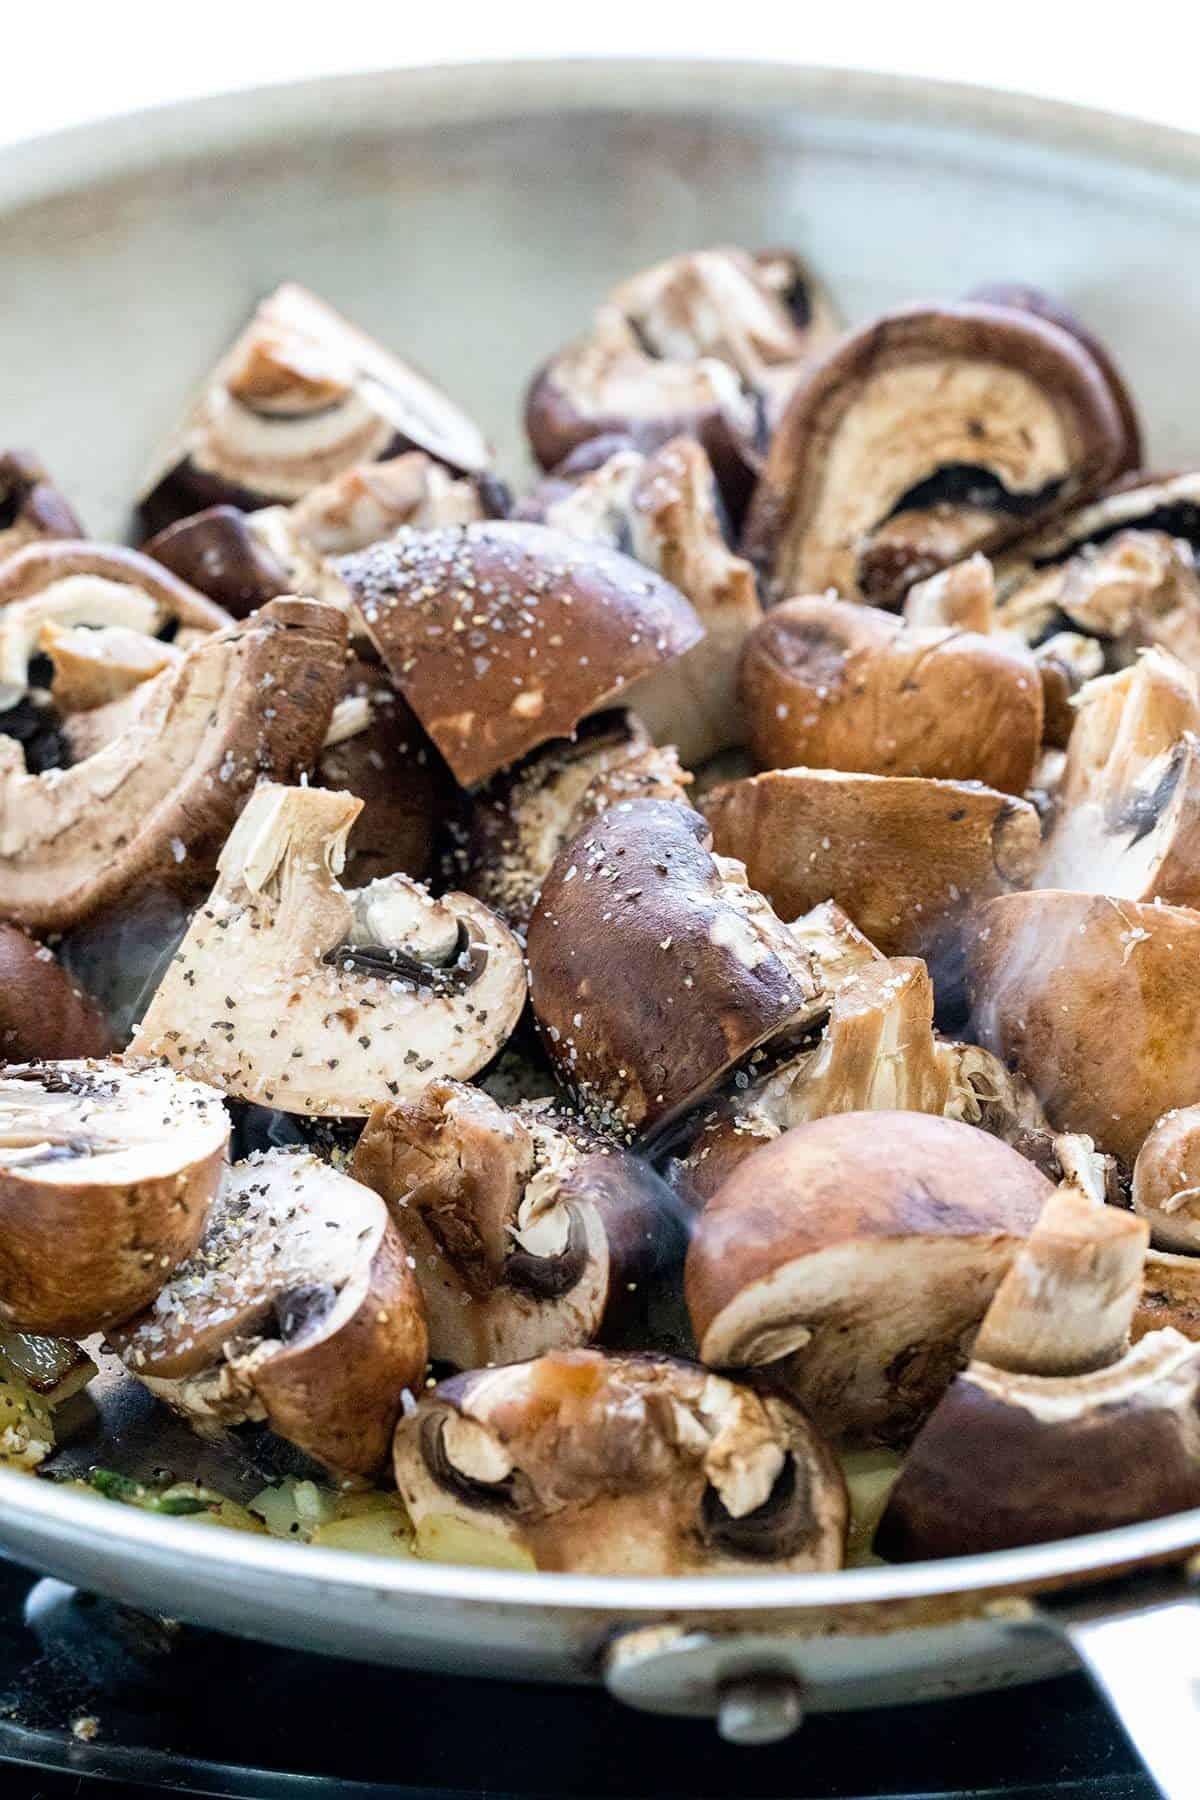 raw mushrooms in a pan